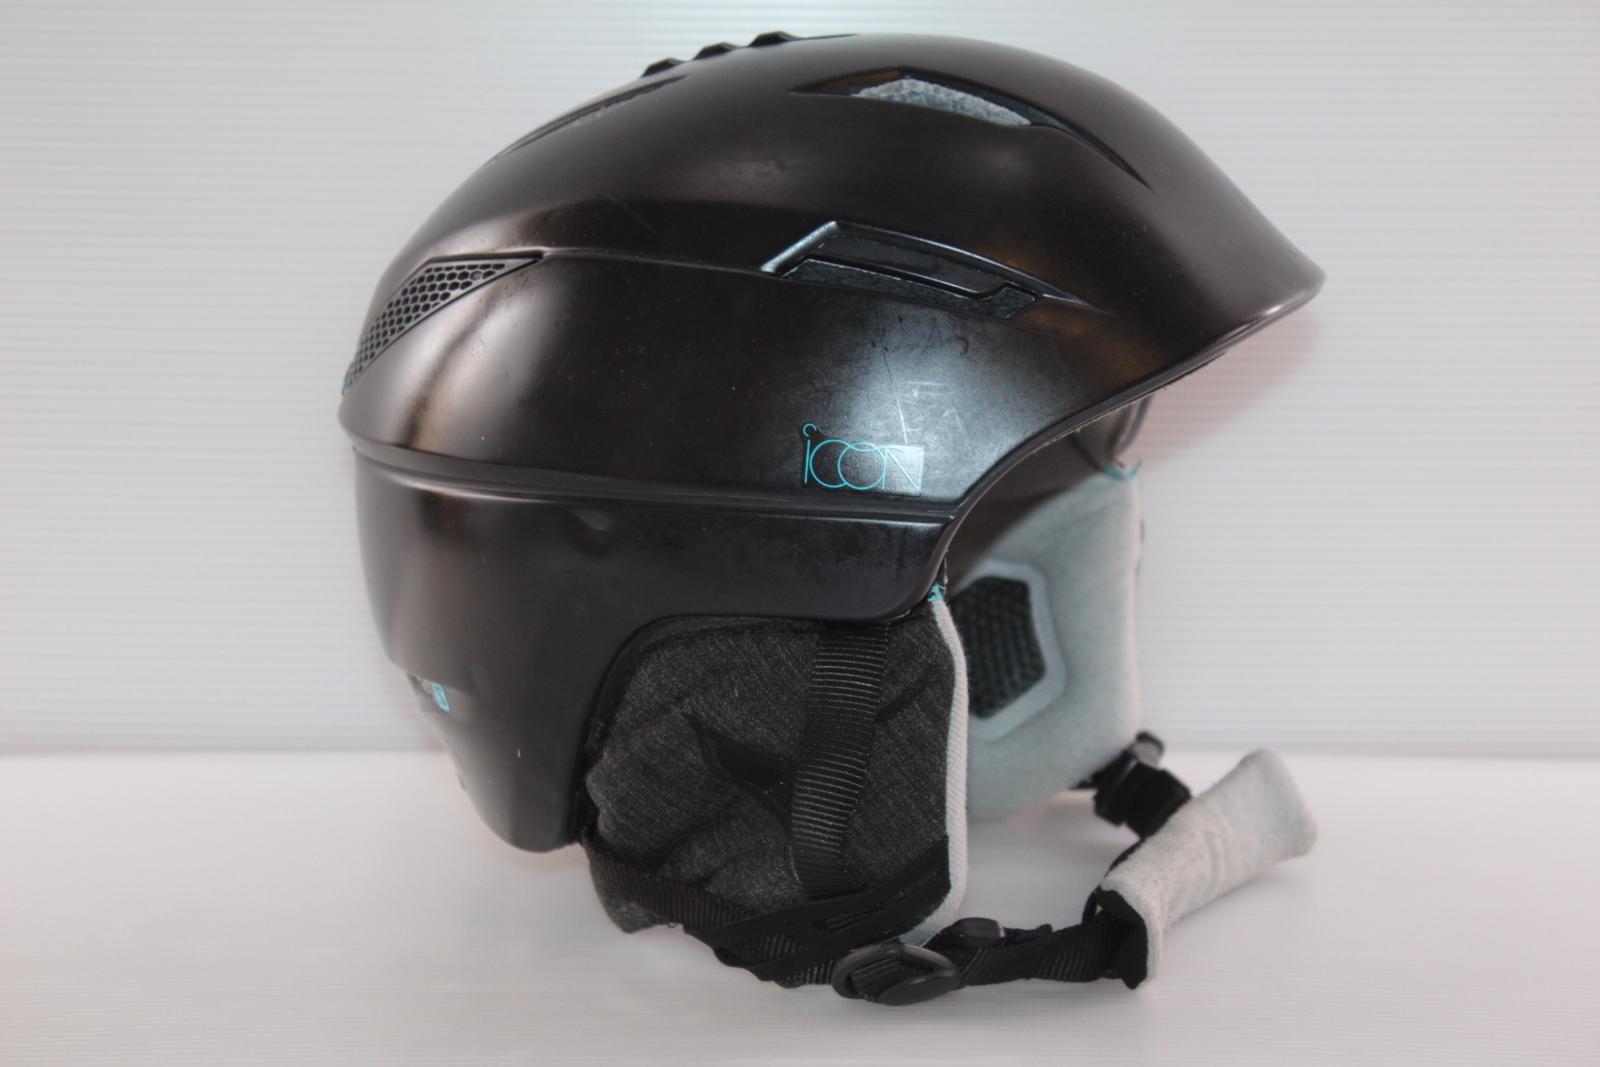 Dámská lyžařská helma Salomon Icon - posuvná vel. 53 - 56